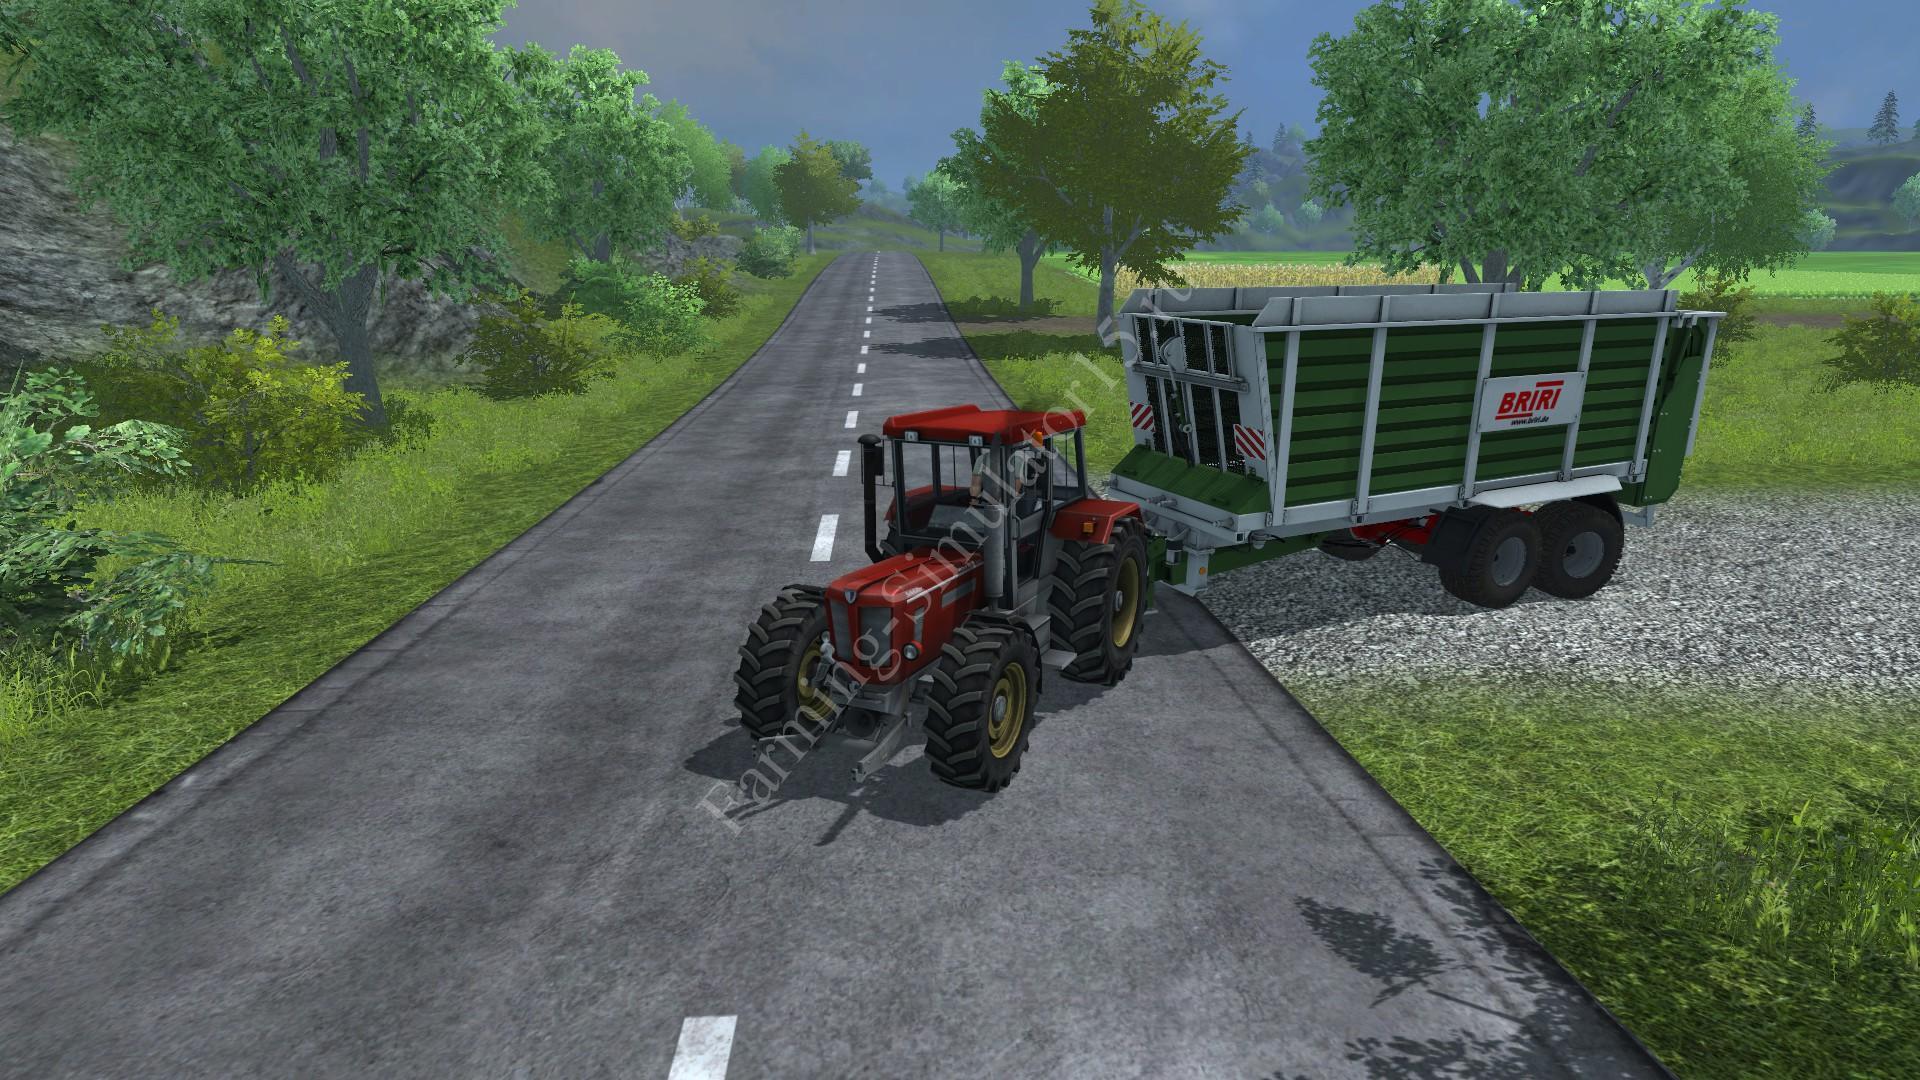 Мод прицепа для силоса Briri SiloTrans 38 v 1.1 Farming Simulator 2013, Farming Simulator 13